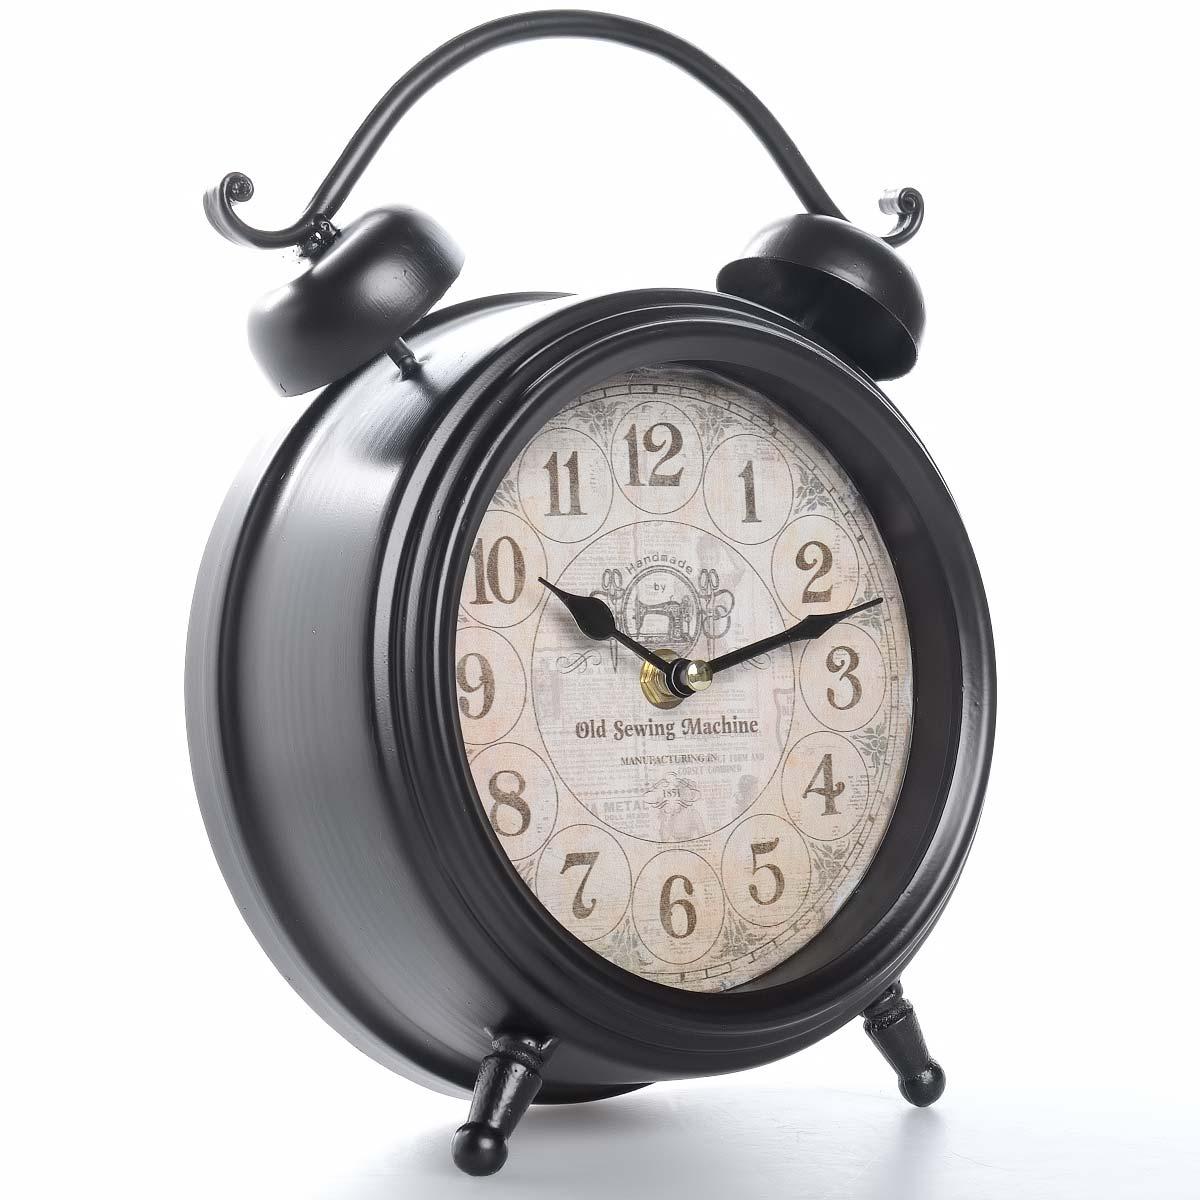 Vintage χειροποίητο διακοσμητικό ρολόι μεταλλικό - ΟΕΜ 51553